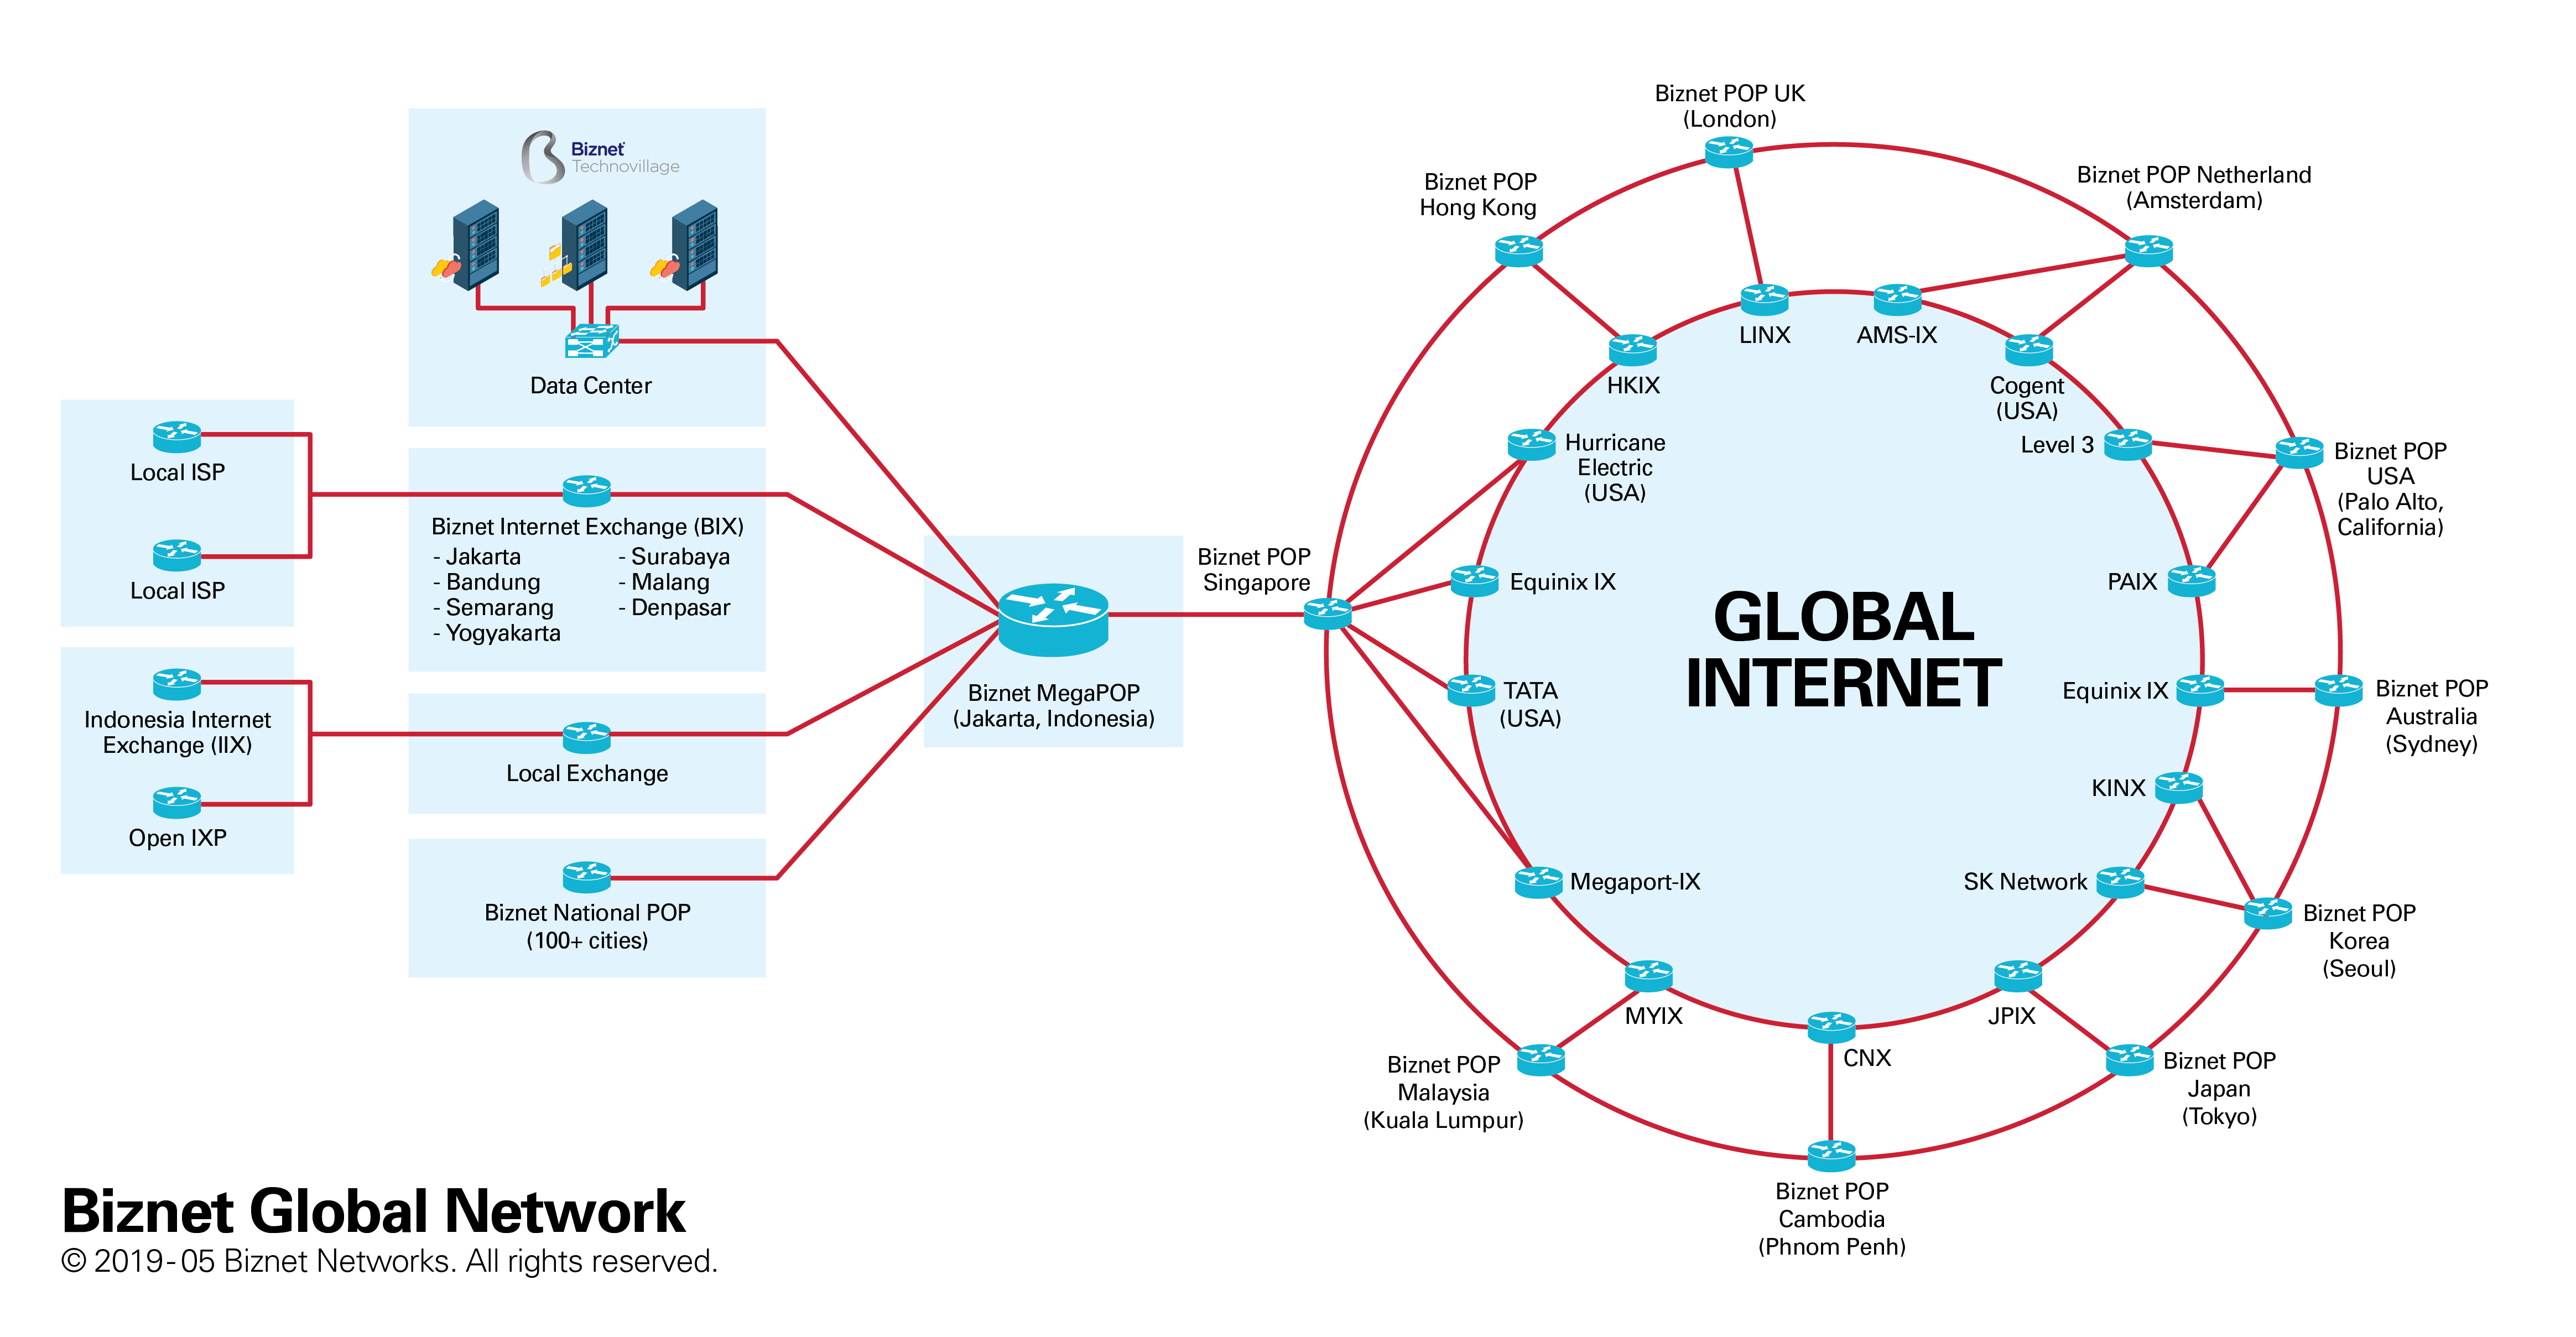 Mpls Network Diagram Biznet Company Network Biznet Global Internet